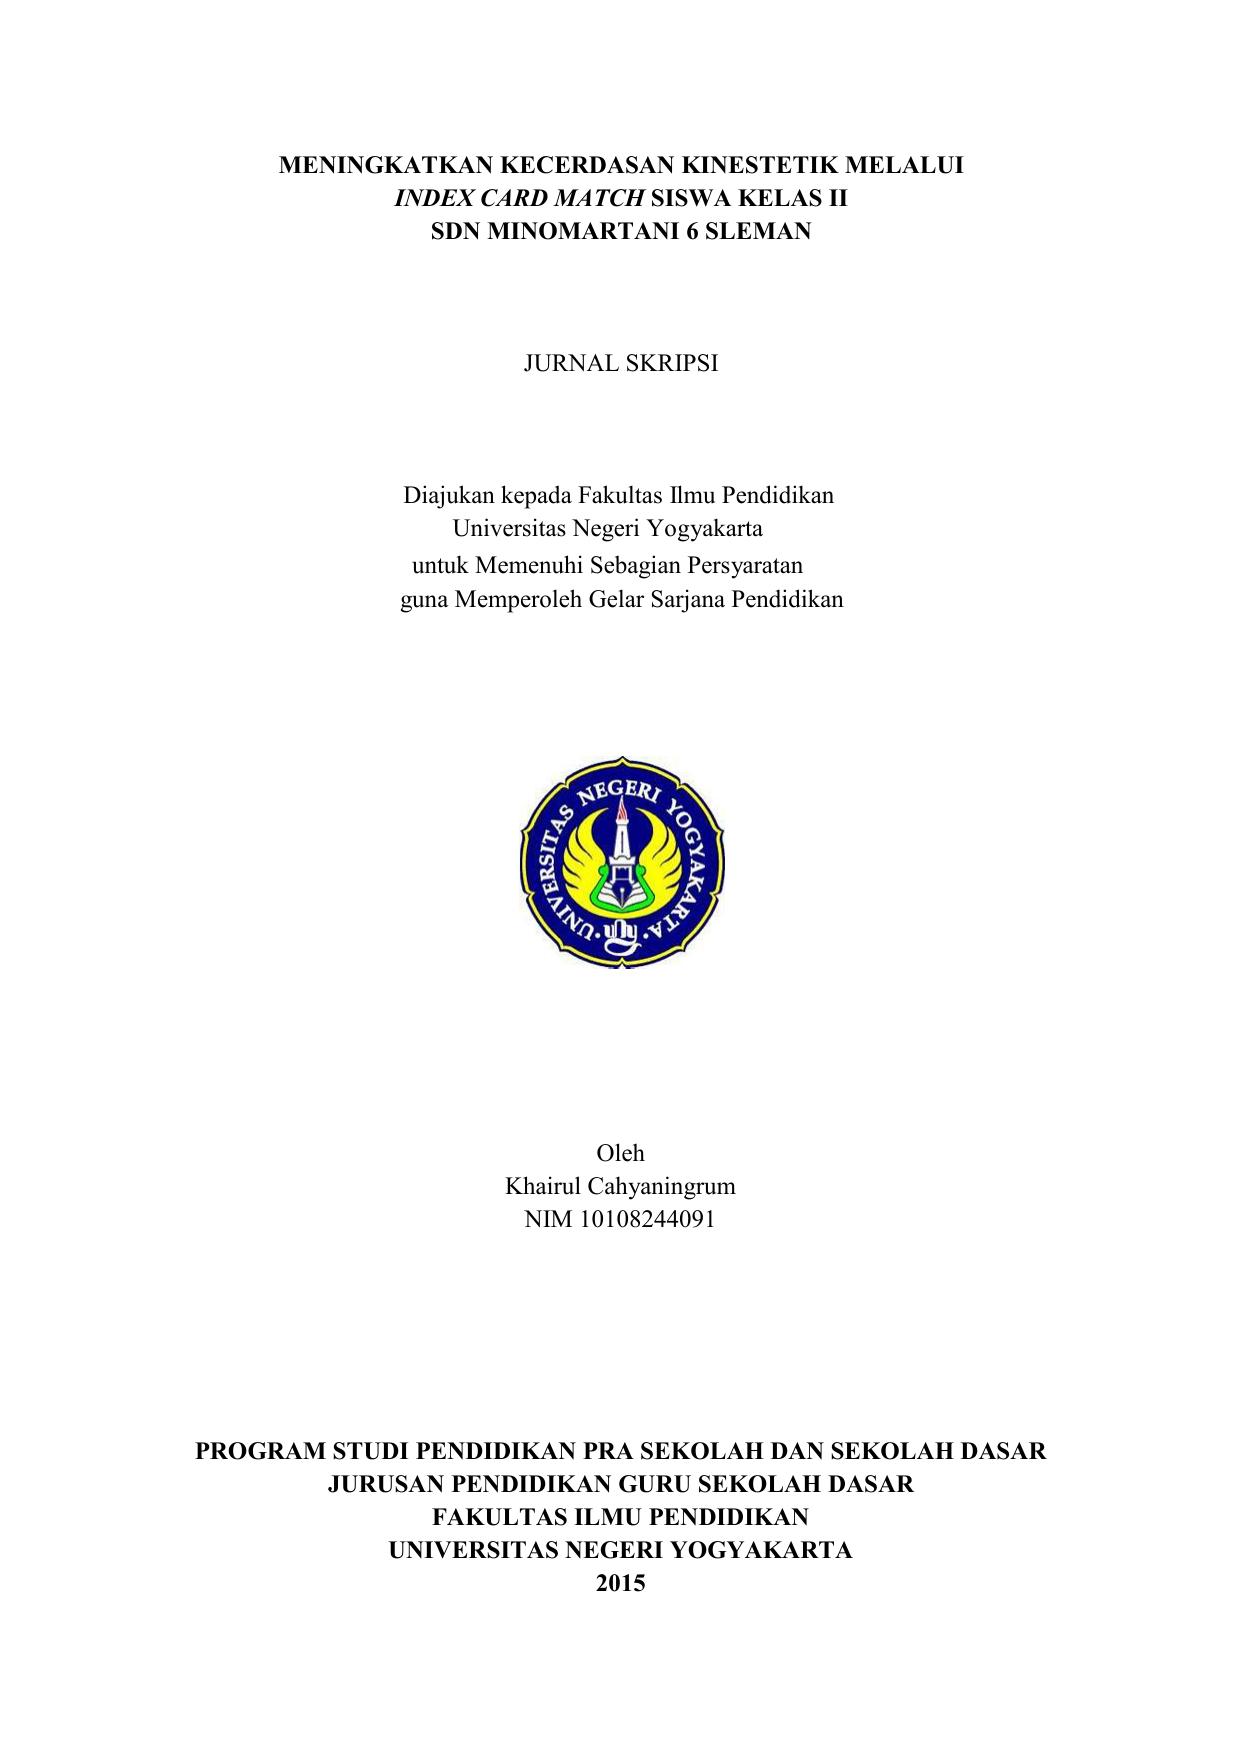 Meningkatkan Kecerdasan Kinestetik Melalui Index